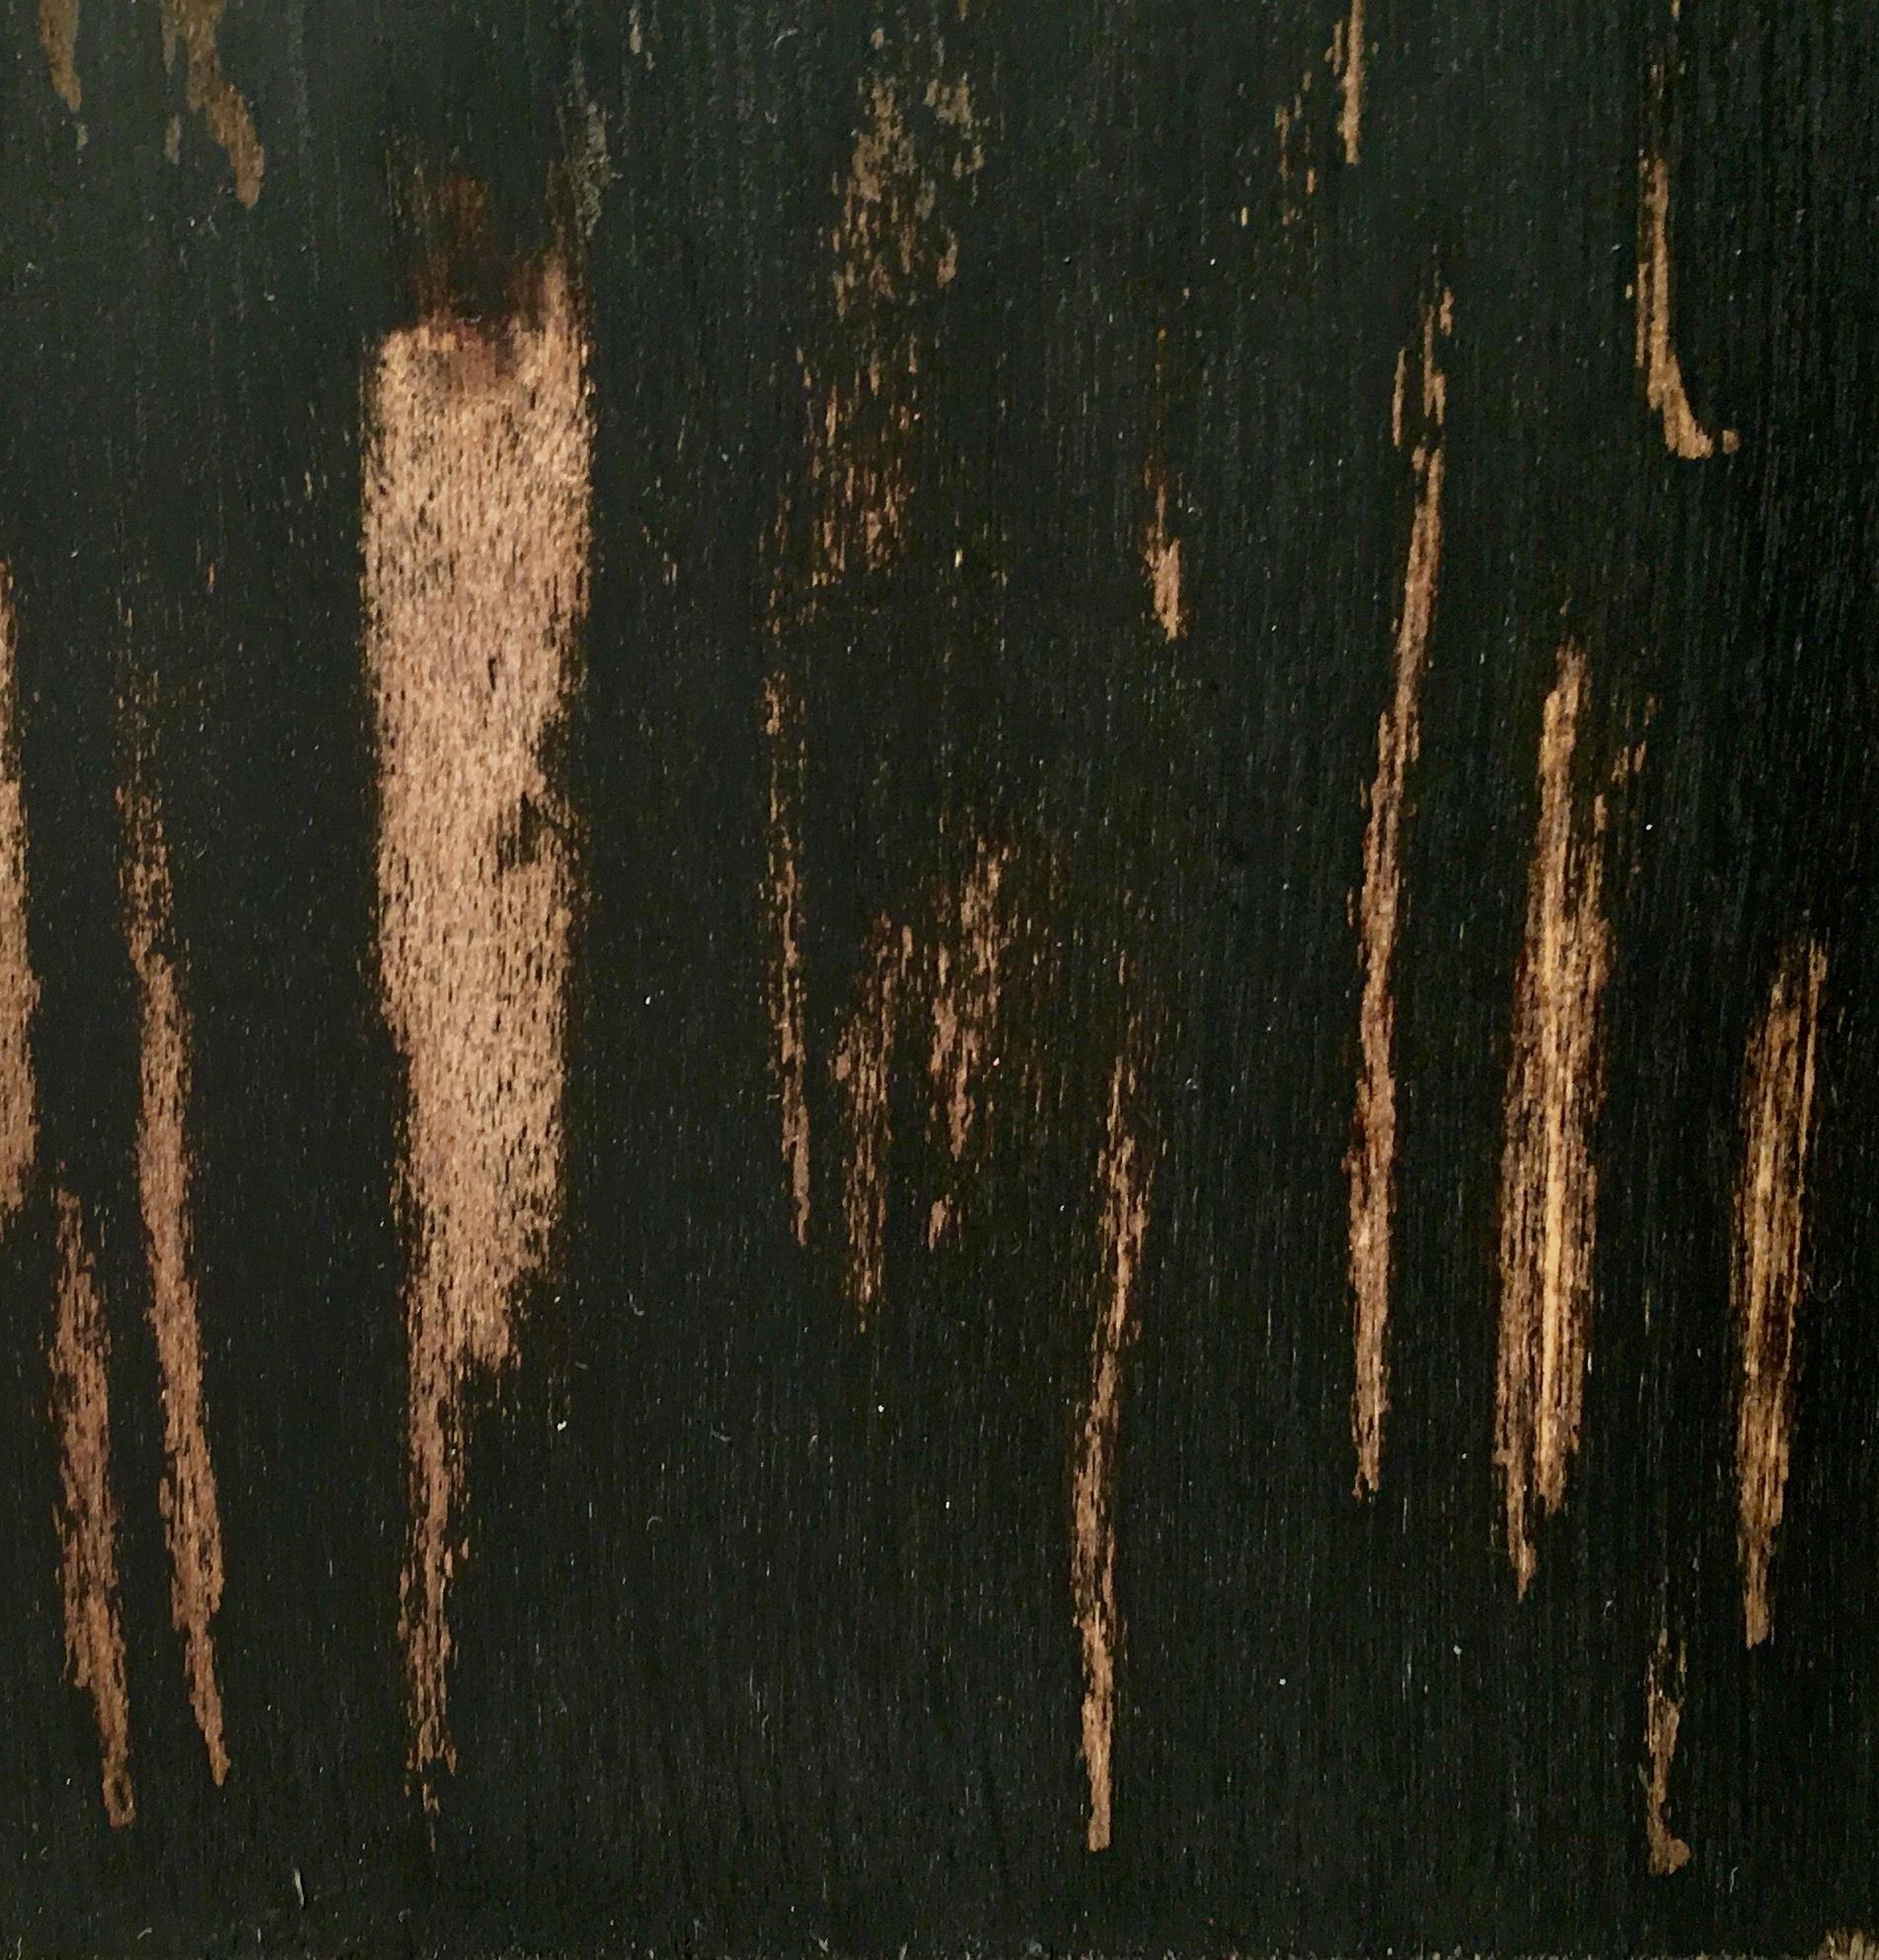 Onyx black over Chestnut stain